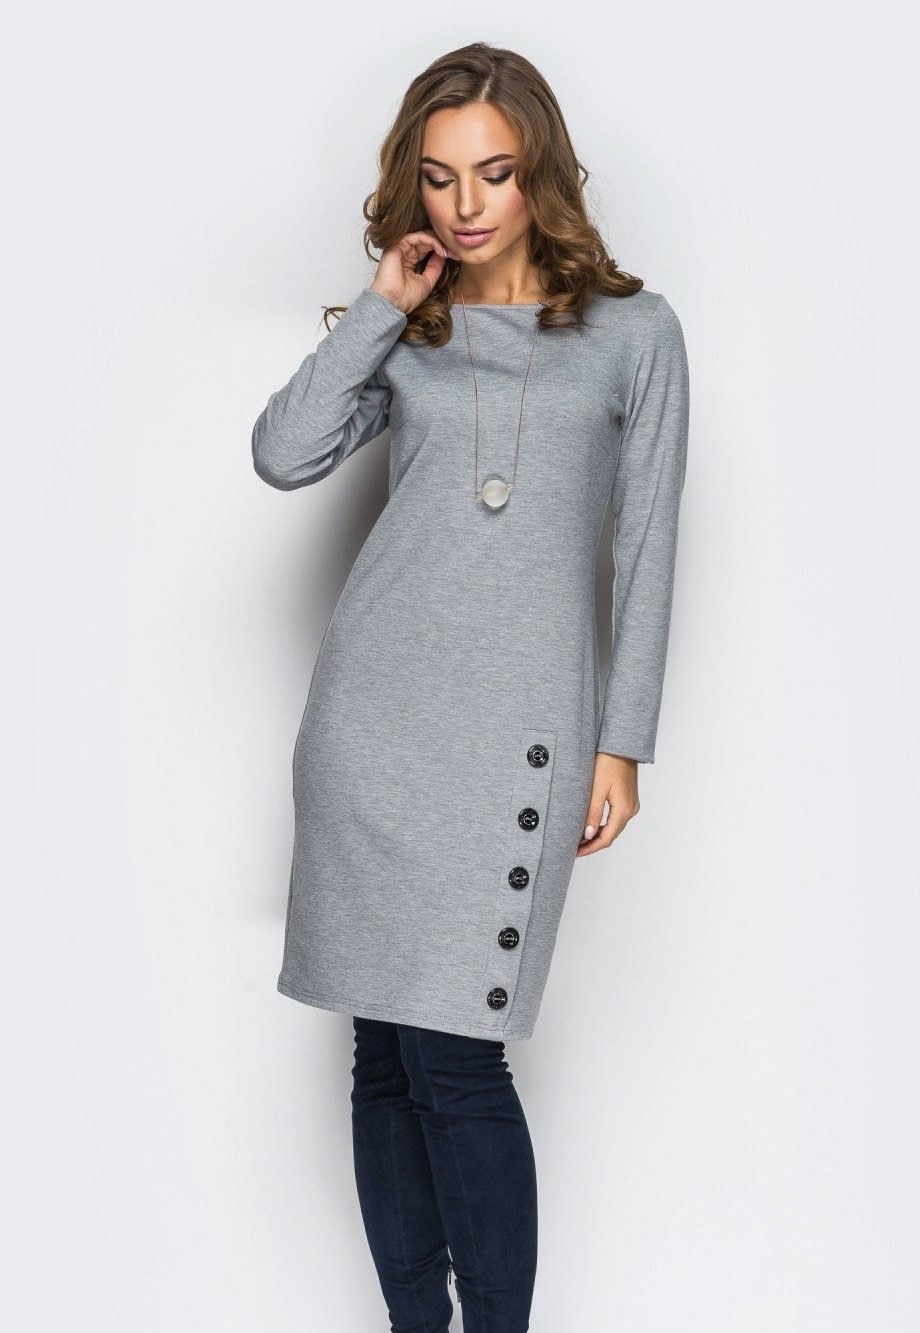 Formal Leicht Graues Kleid Langarm Vertrieb15 Leicht Graues Kleid Langarm Spezialgebiet